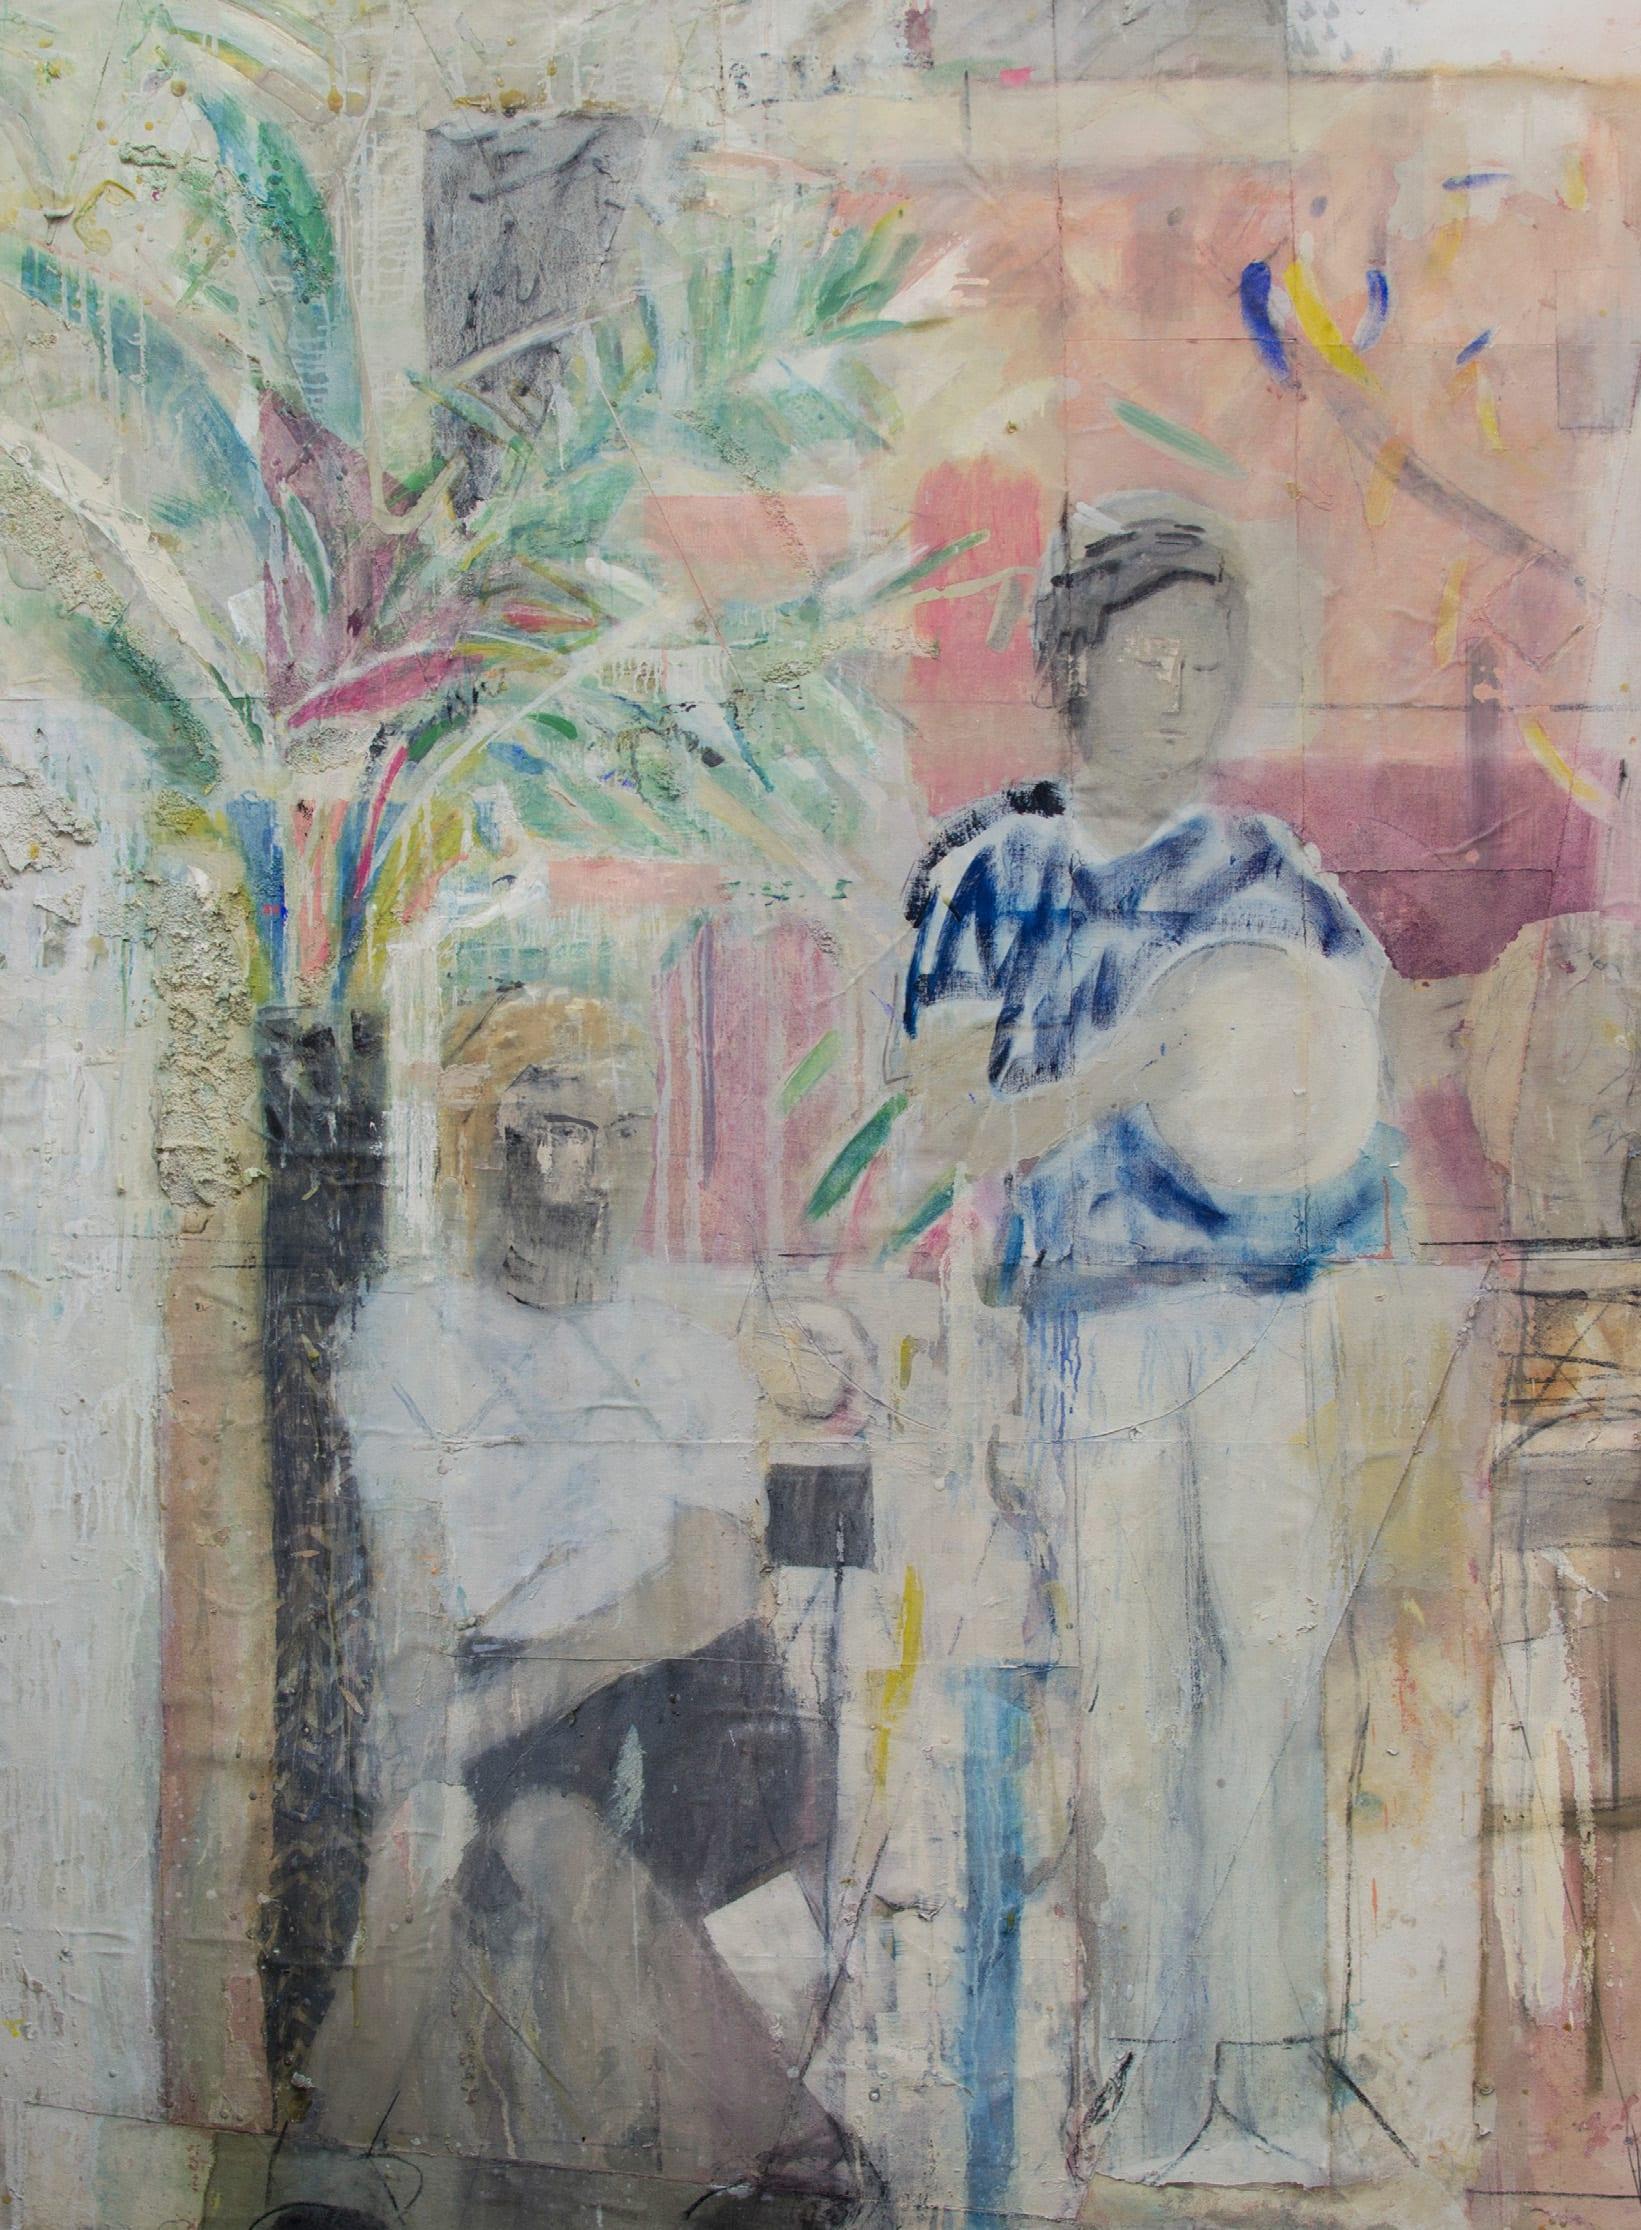 "<span class=""link fancybox-details-link""><a href=""/exhibitions/26/works/artworks1239/"">View Detail Page</a></span><div class=""artist""><strong>Nick Jensen</strong></div><div class=""title""><em>Moroccan Girl</em>, 2019</div><div class=""medium"">Oil on collaged canvas</div><div class=""dimensions"">190 x 140cm</div>"